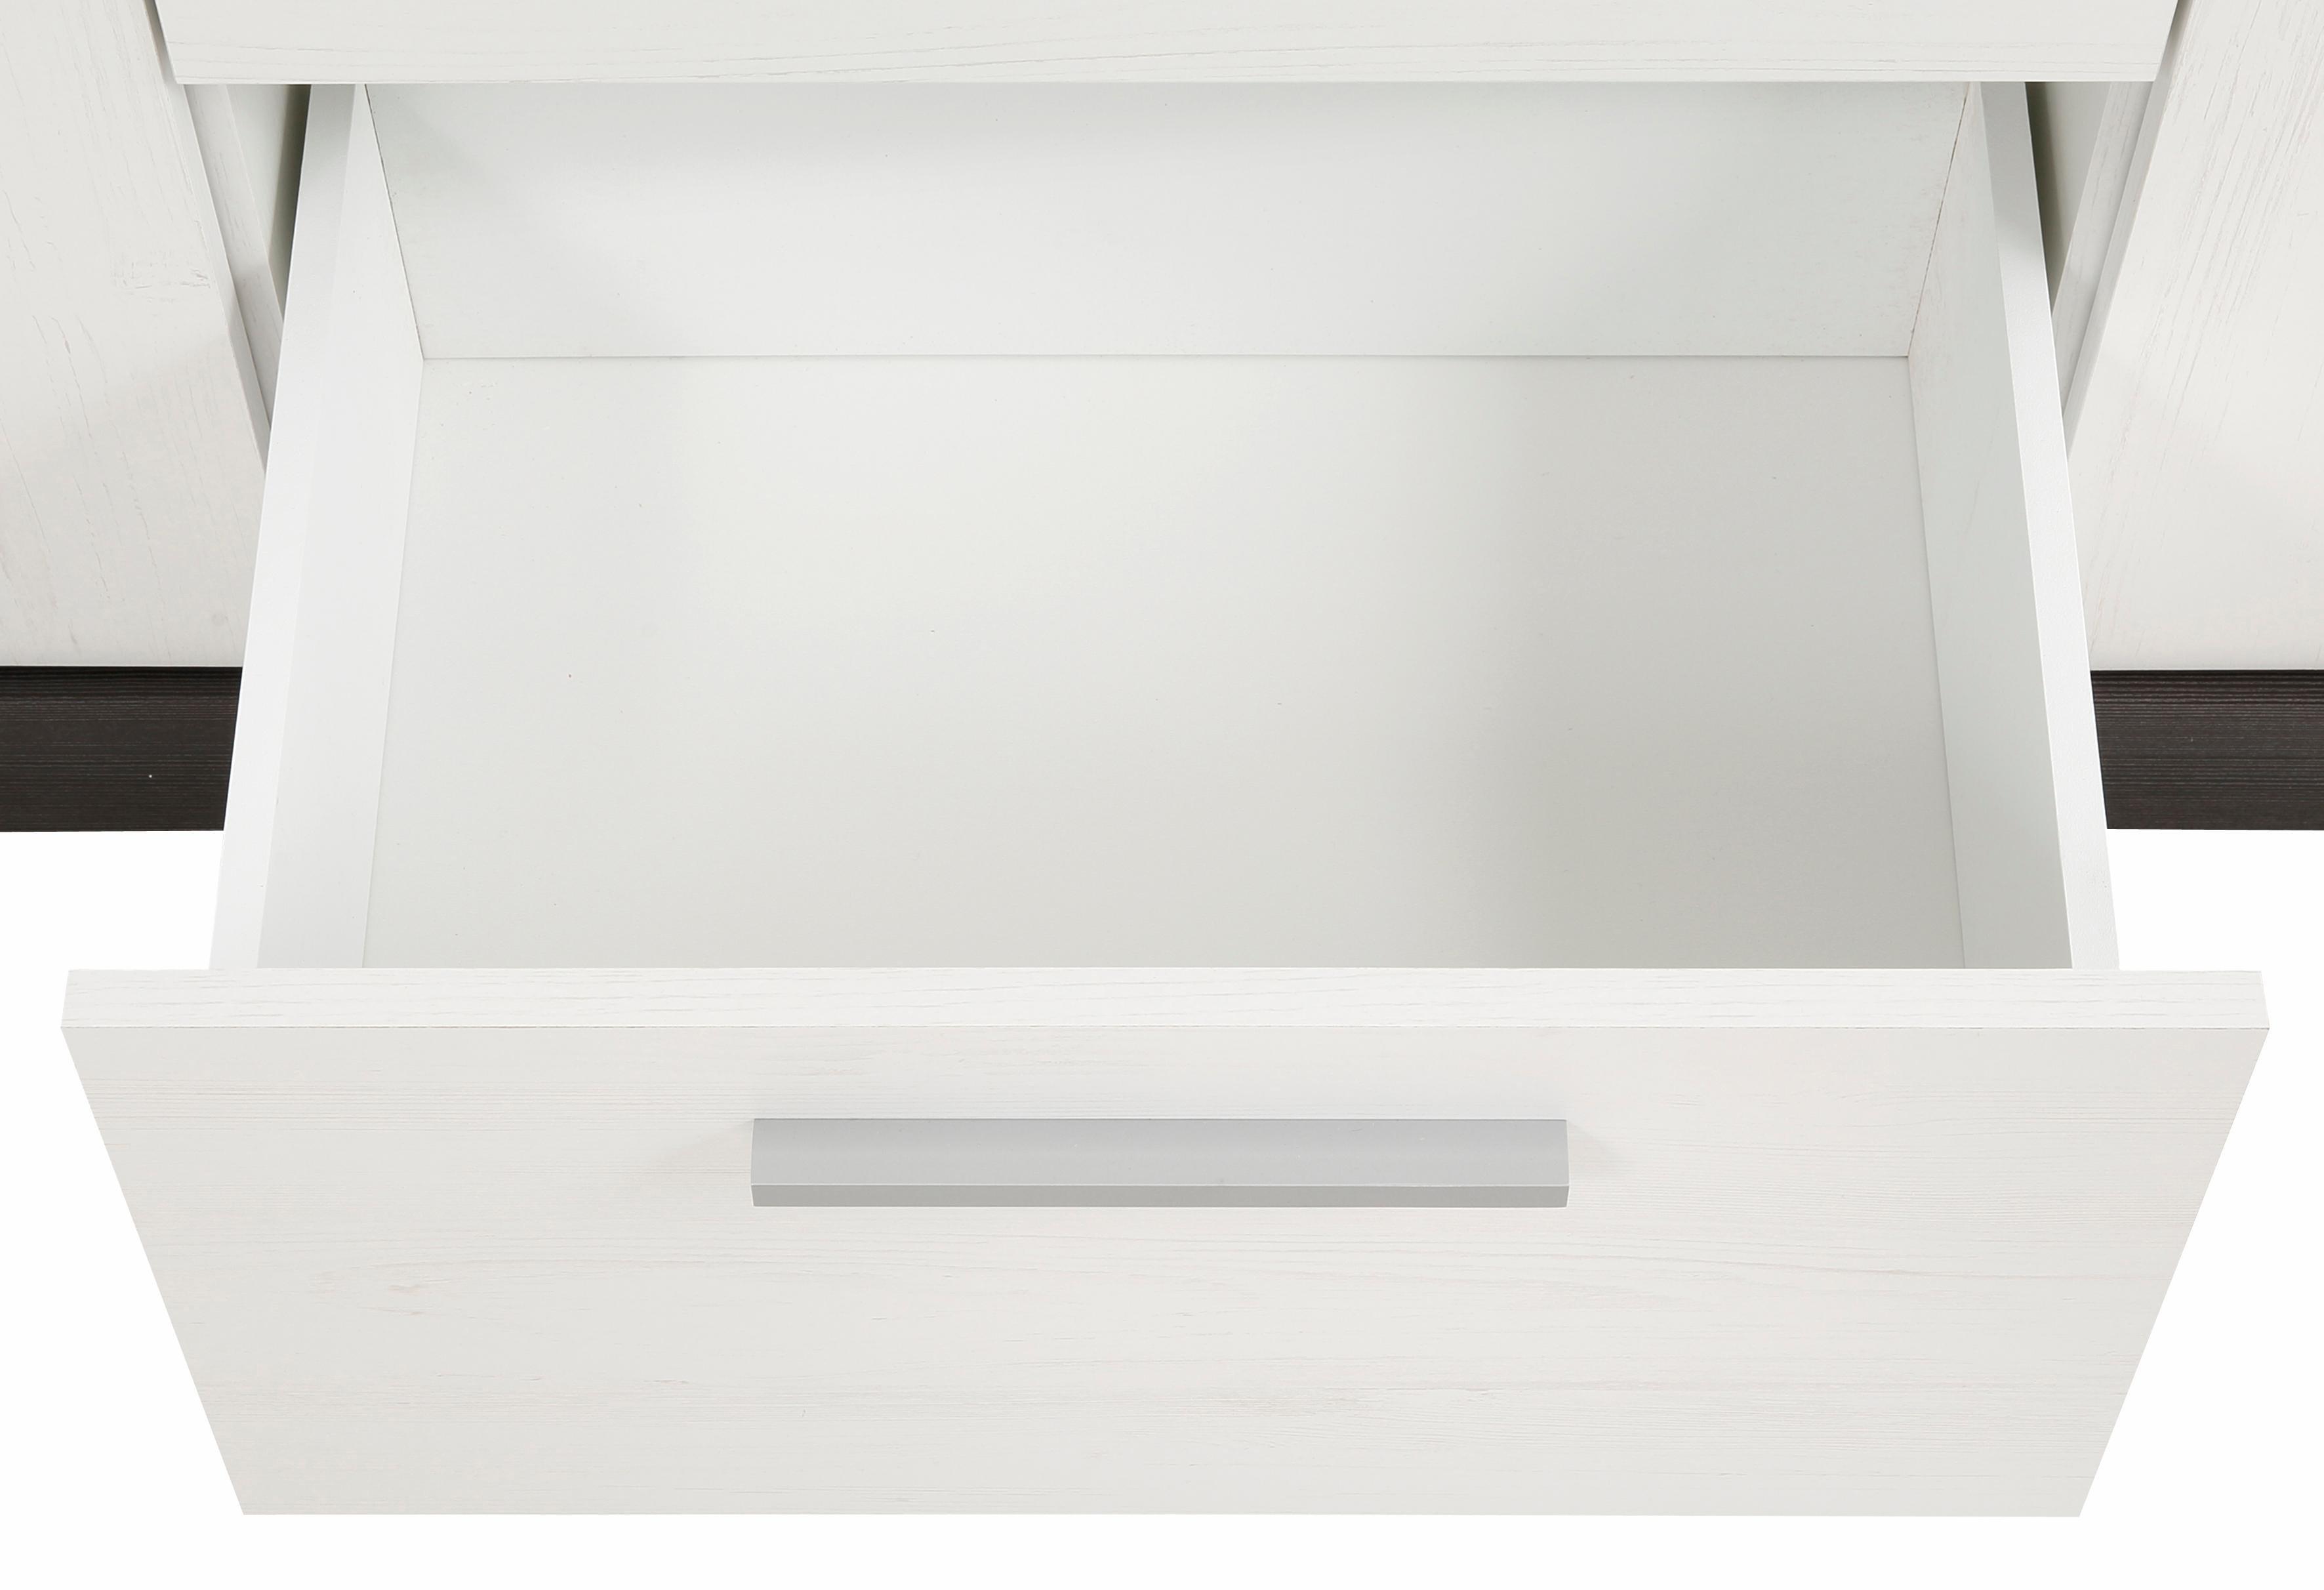 Fotoplank 120 Cm.Home Affaire Highboard Siena Breedte 141 Cm Online Shoppen Otto